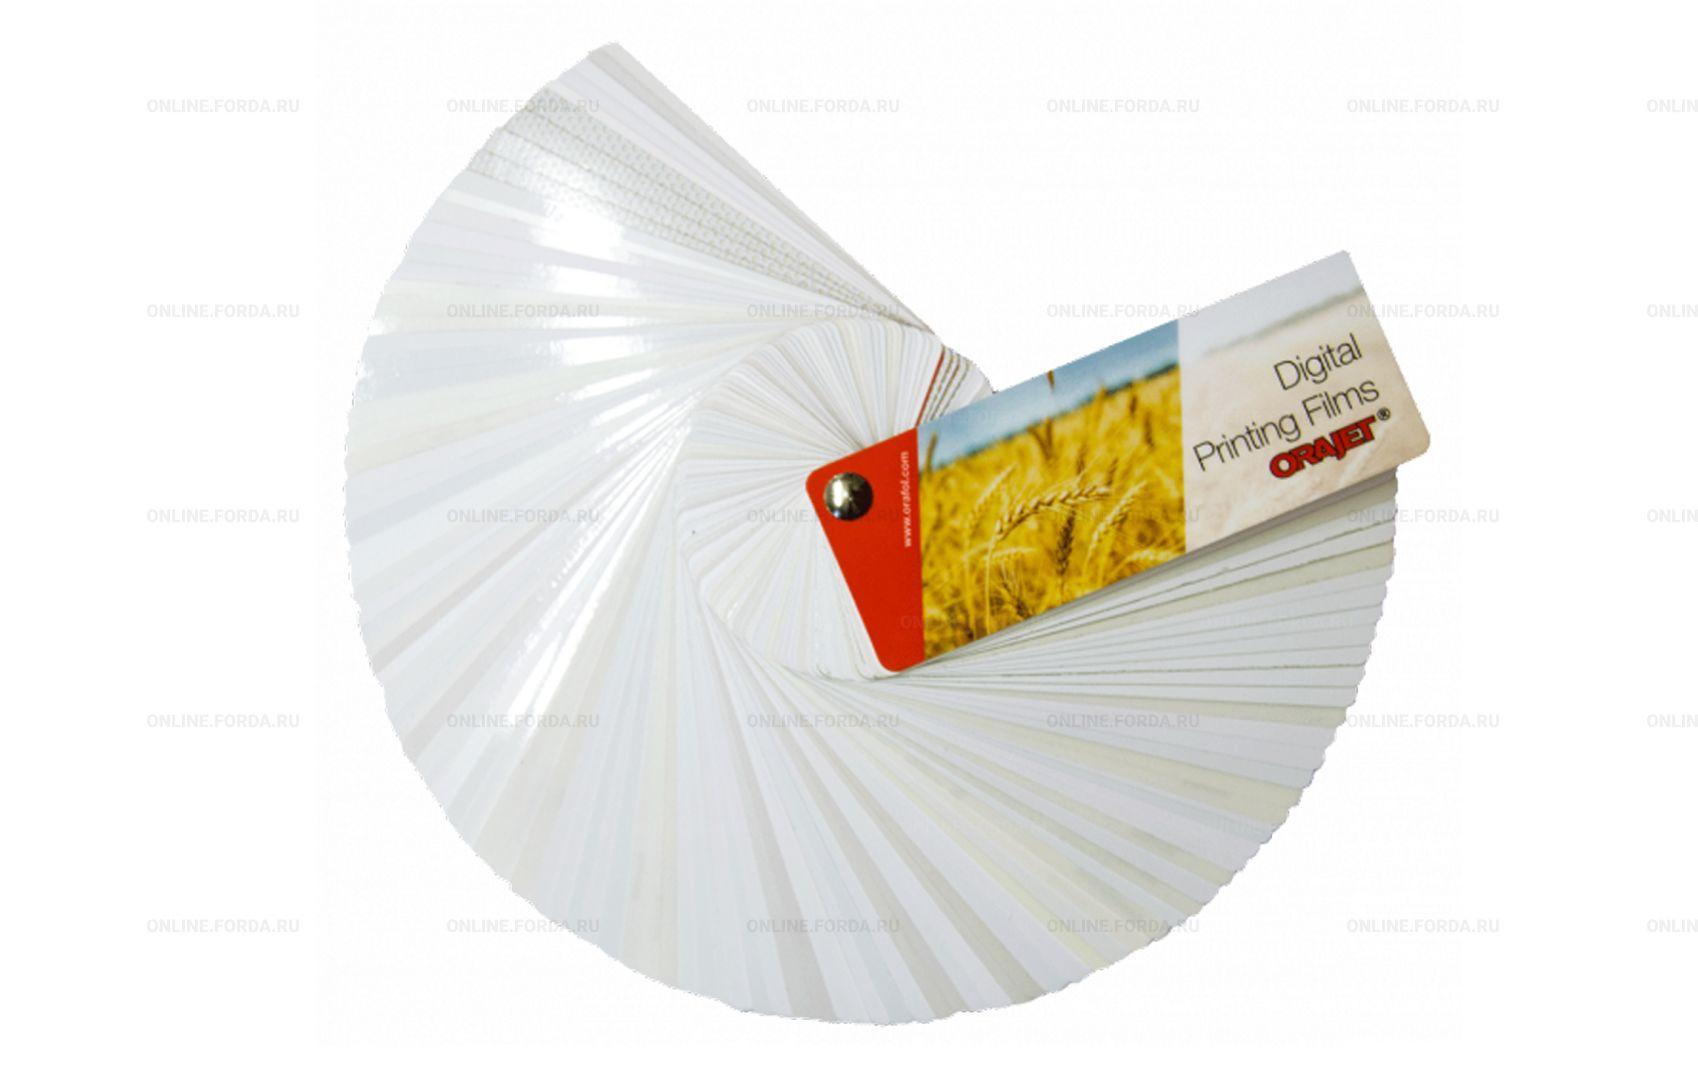 Веер образцов пленок для цифровой печати Orajet